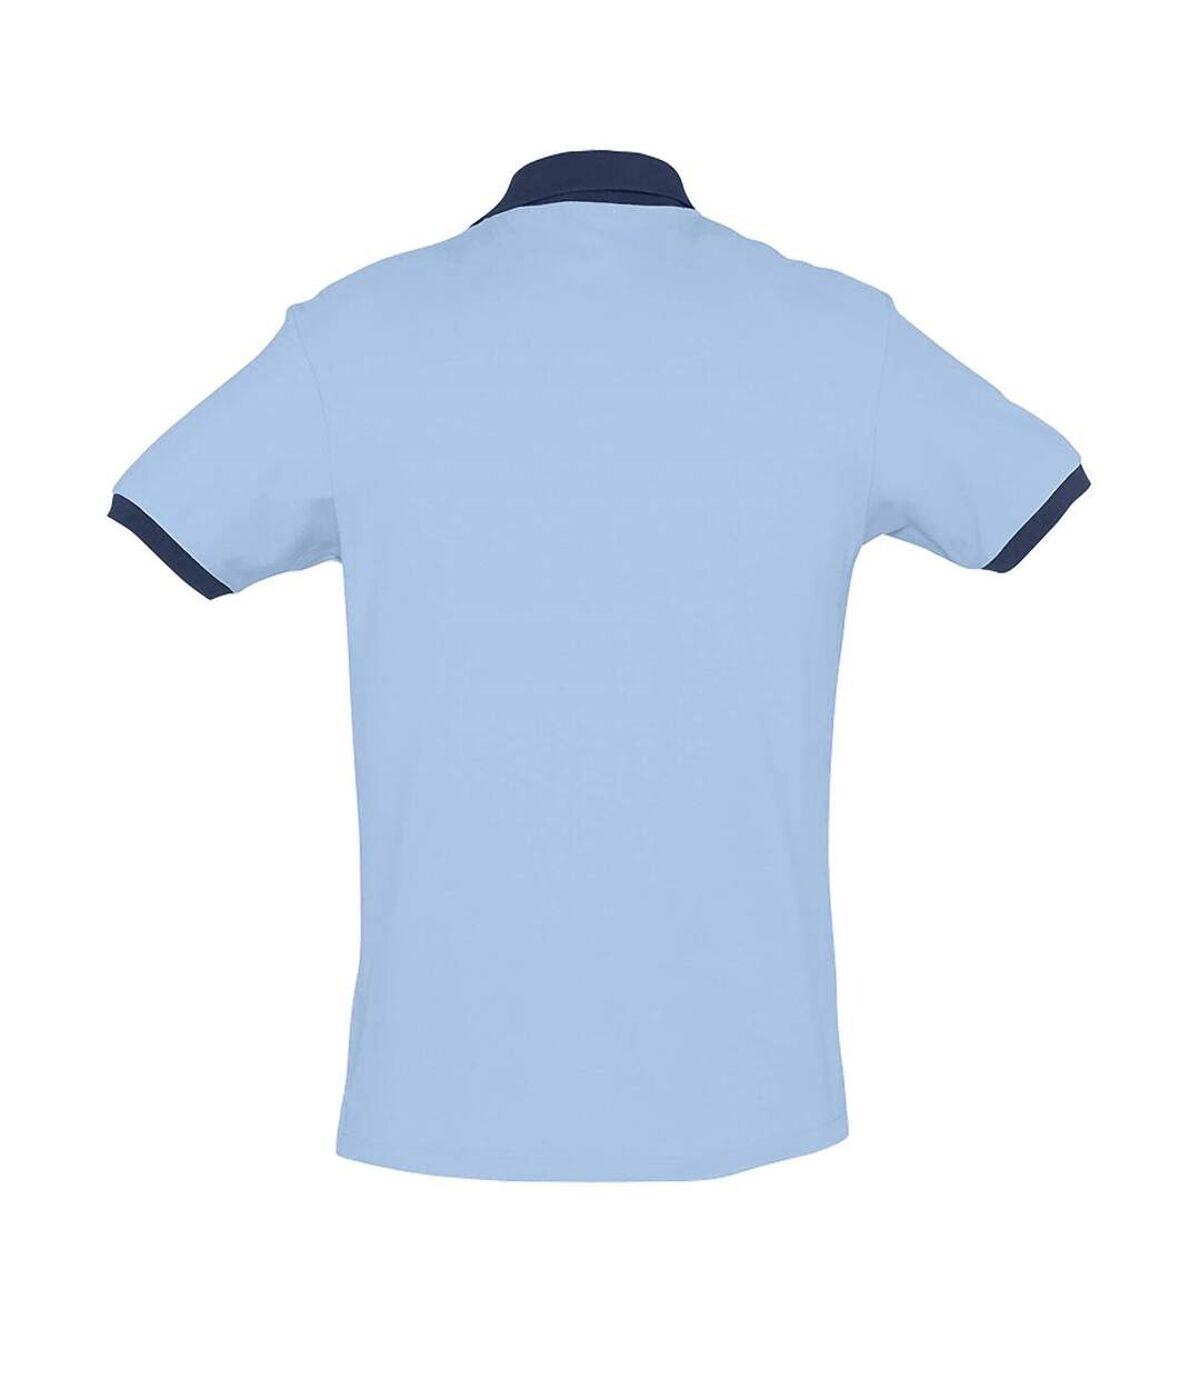 SOLS Prince Unisex Contrast Pique Short Sleeve Cotton Polo Shirt (Sky Blue/French Navy) - UTPC323